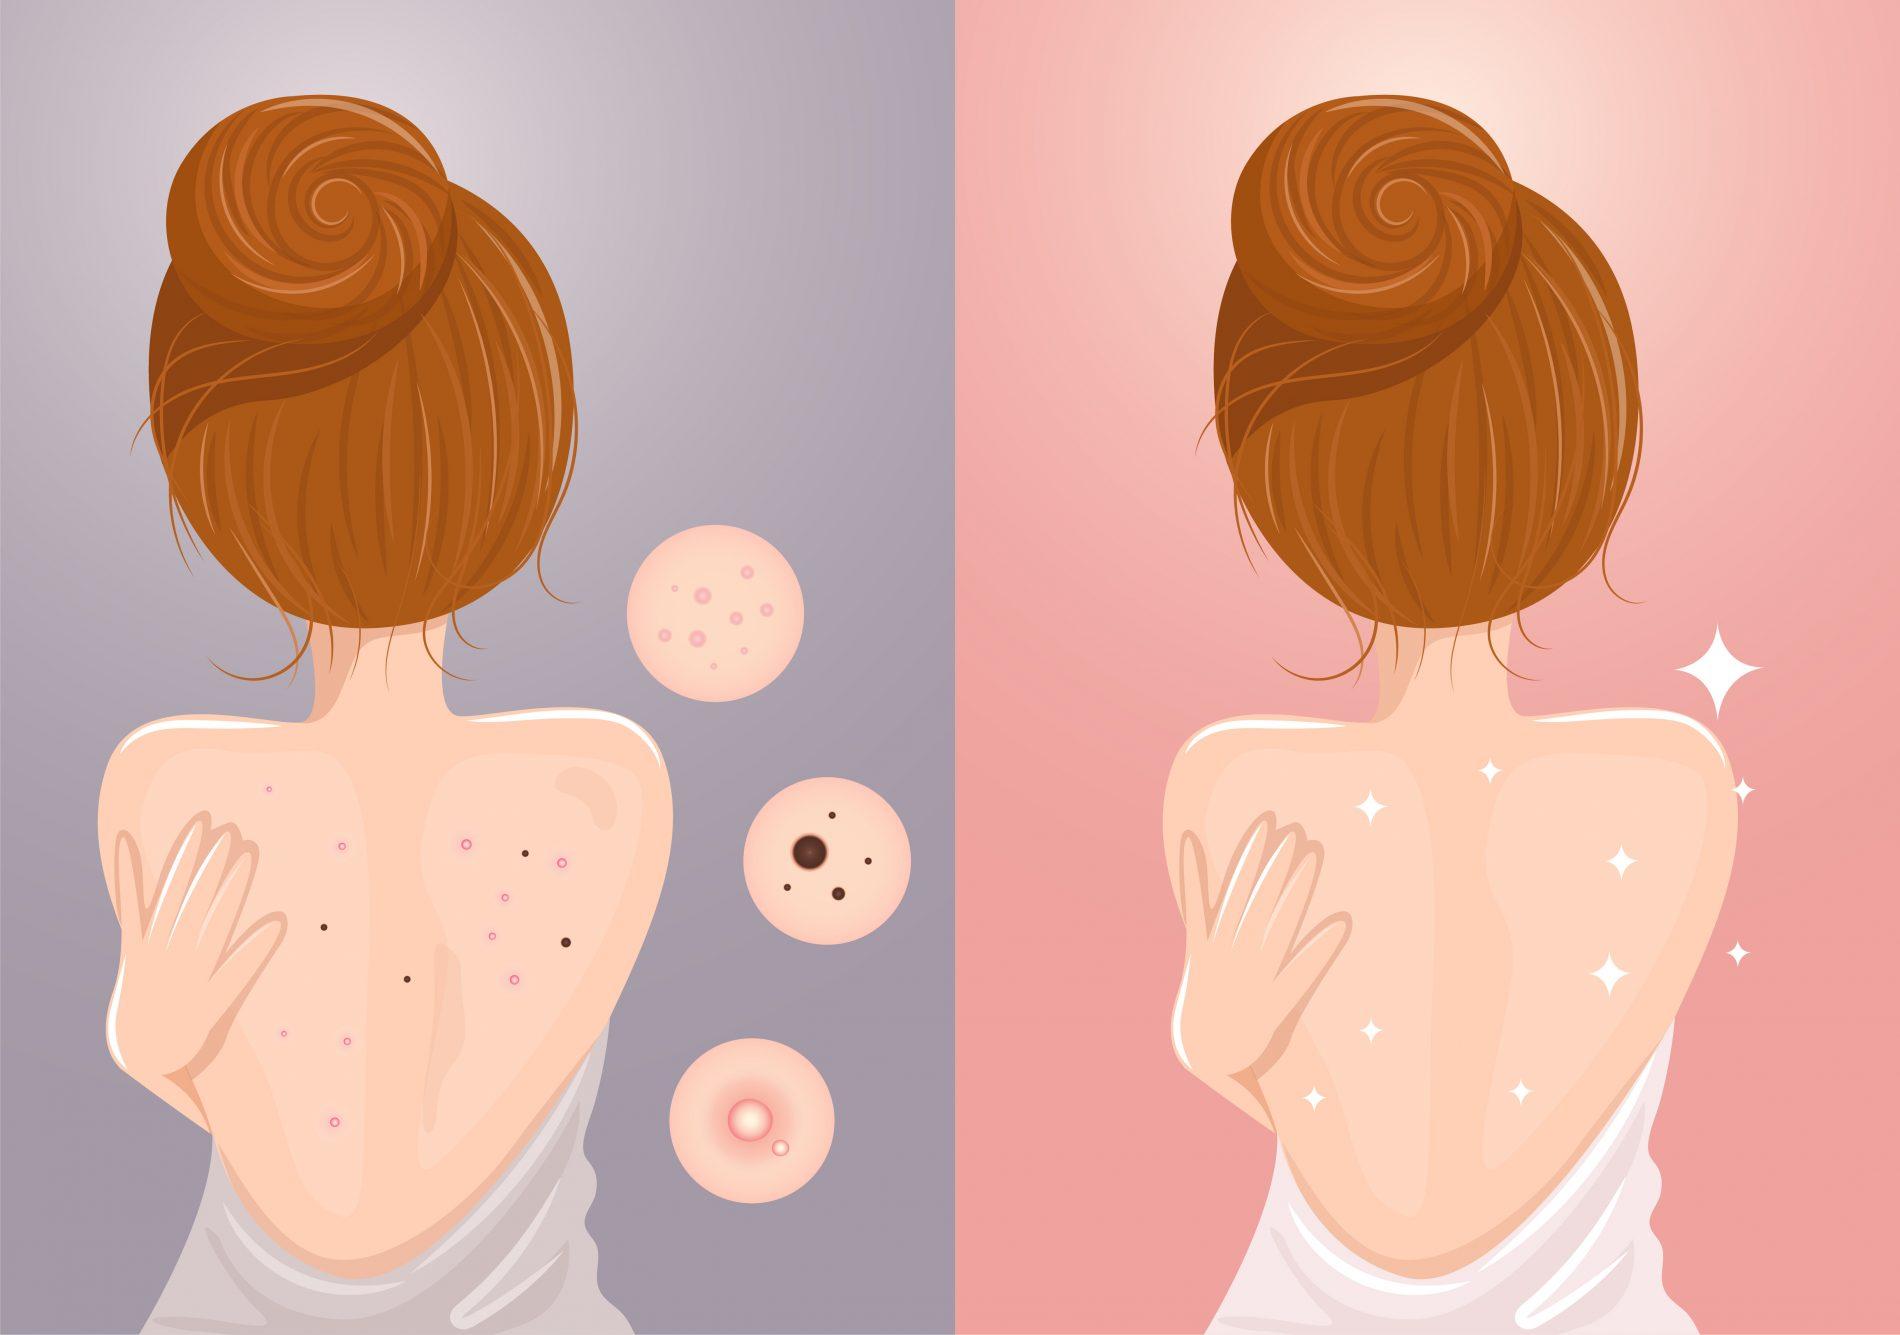 acne: cause